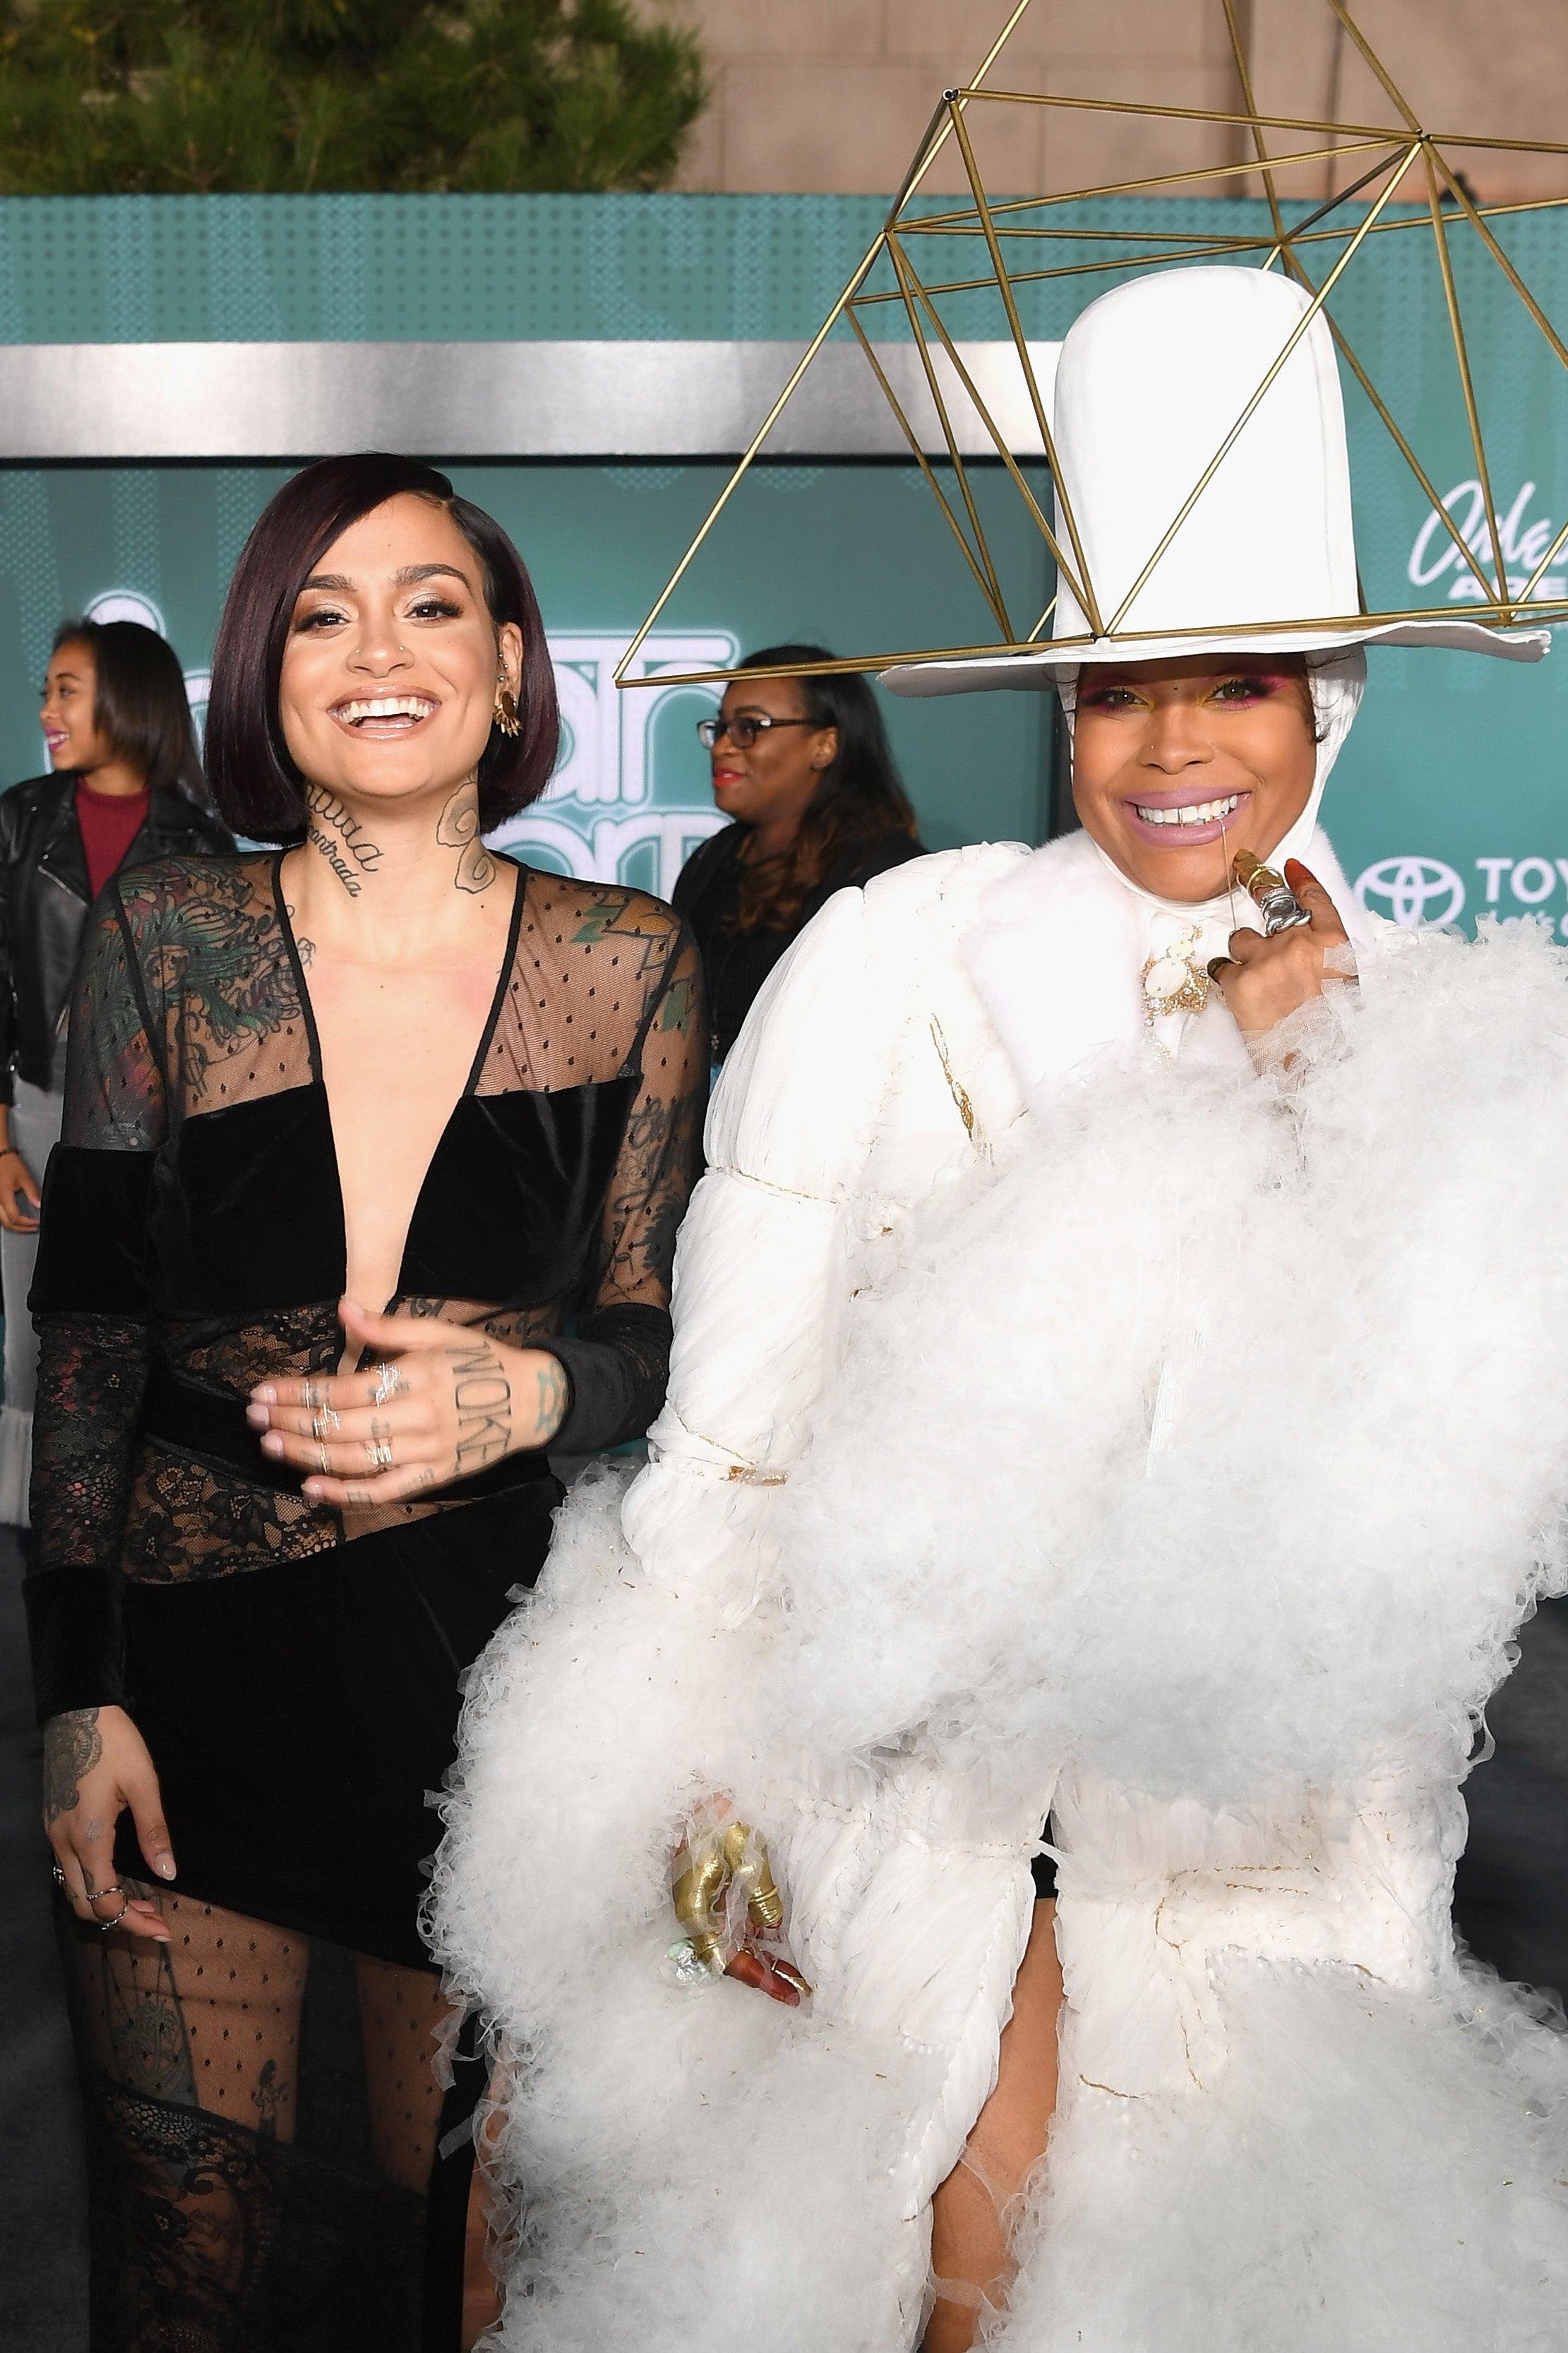 2017 Soul Train Music Awards - Essence